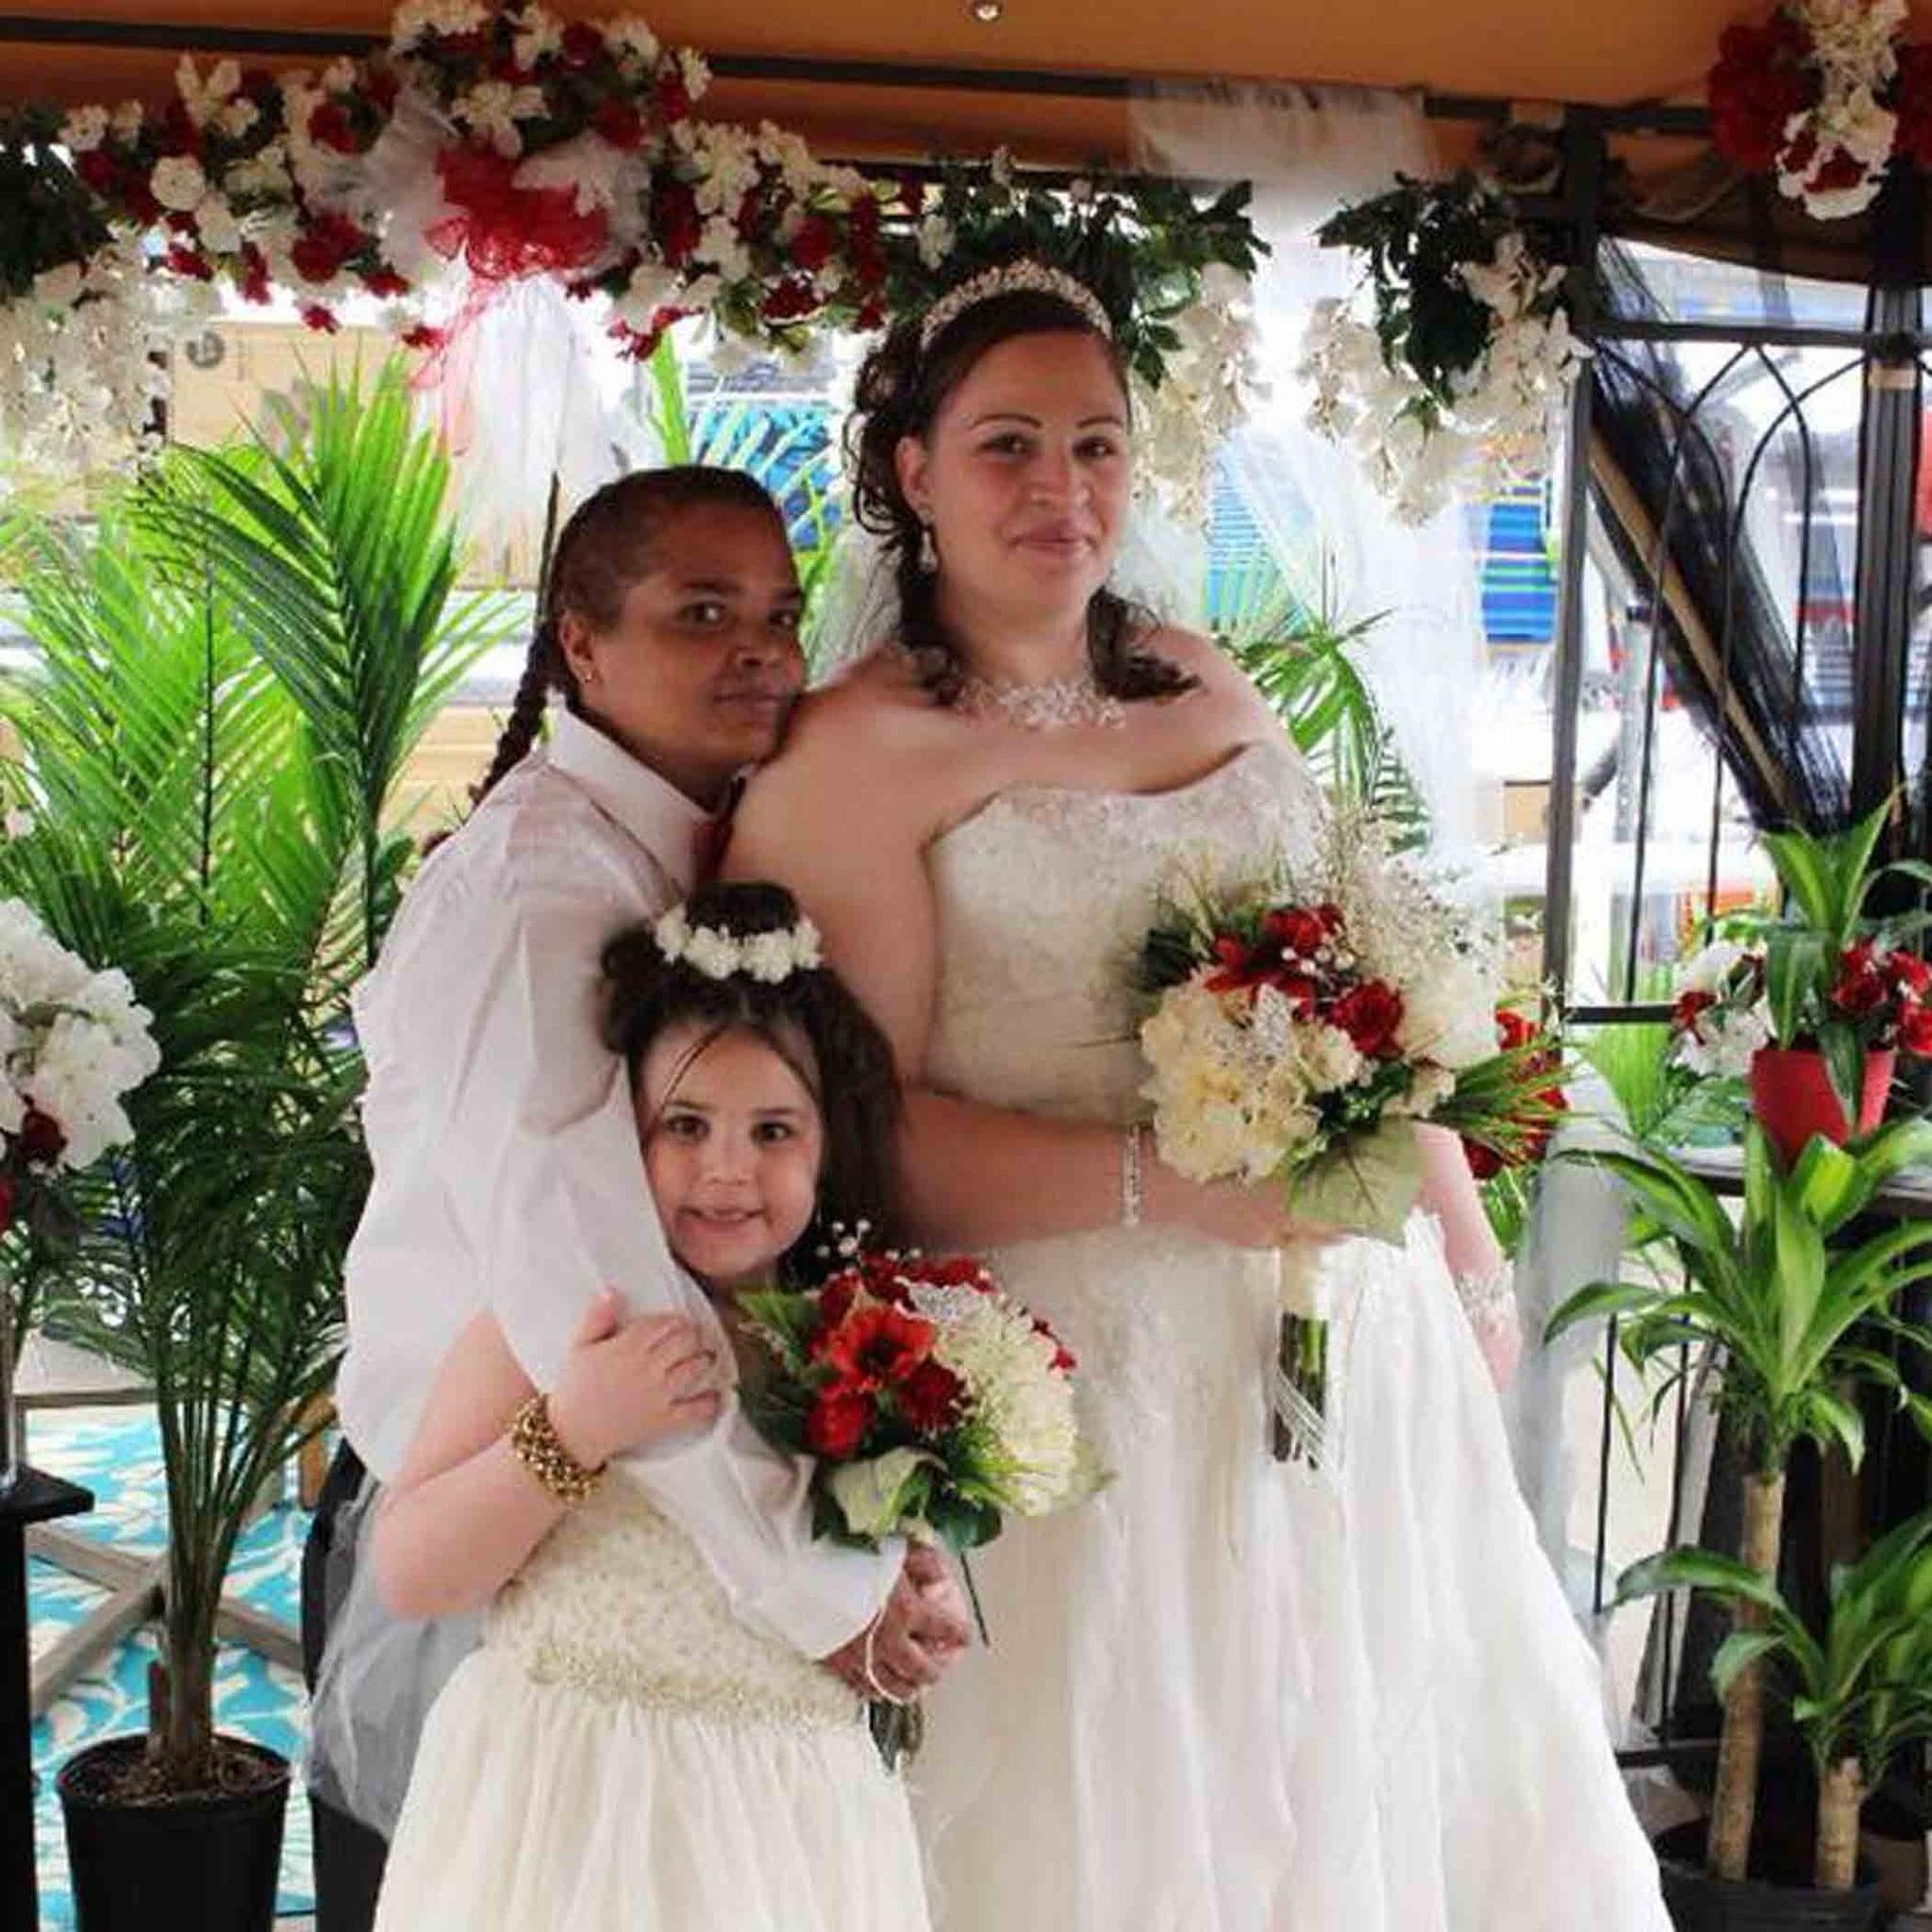 Couple Gets Married In Walmart Popsugar Family